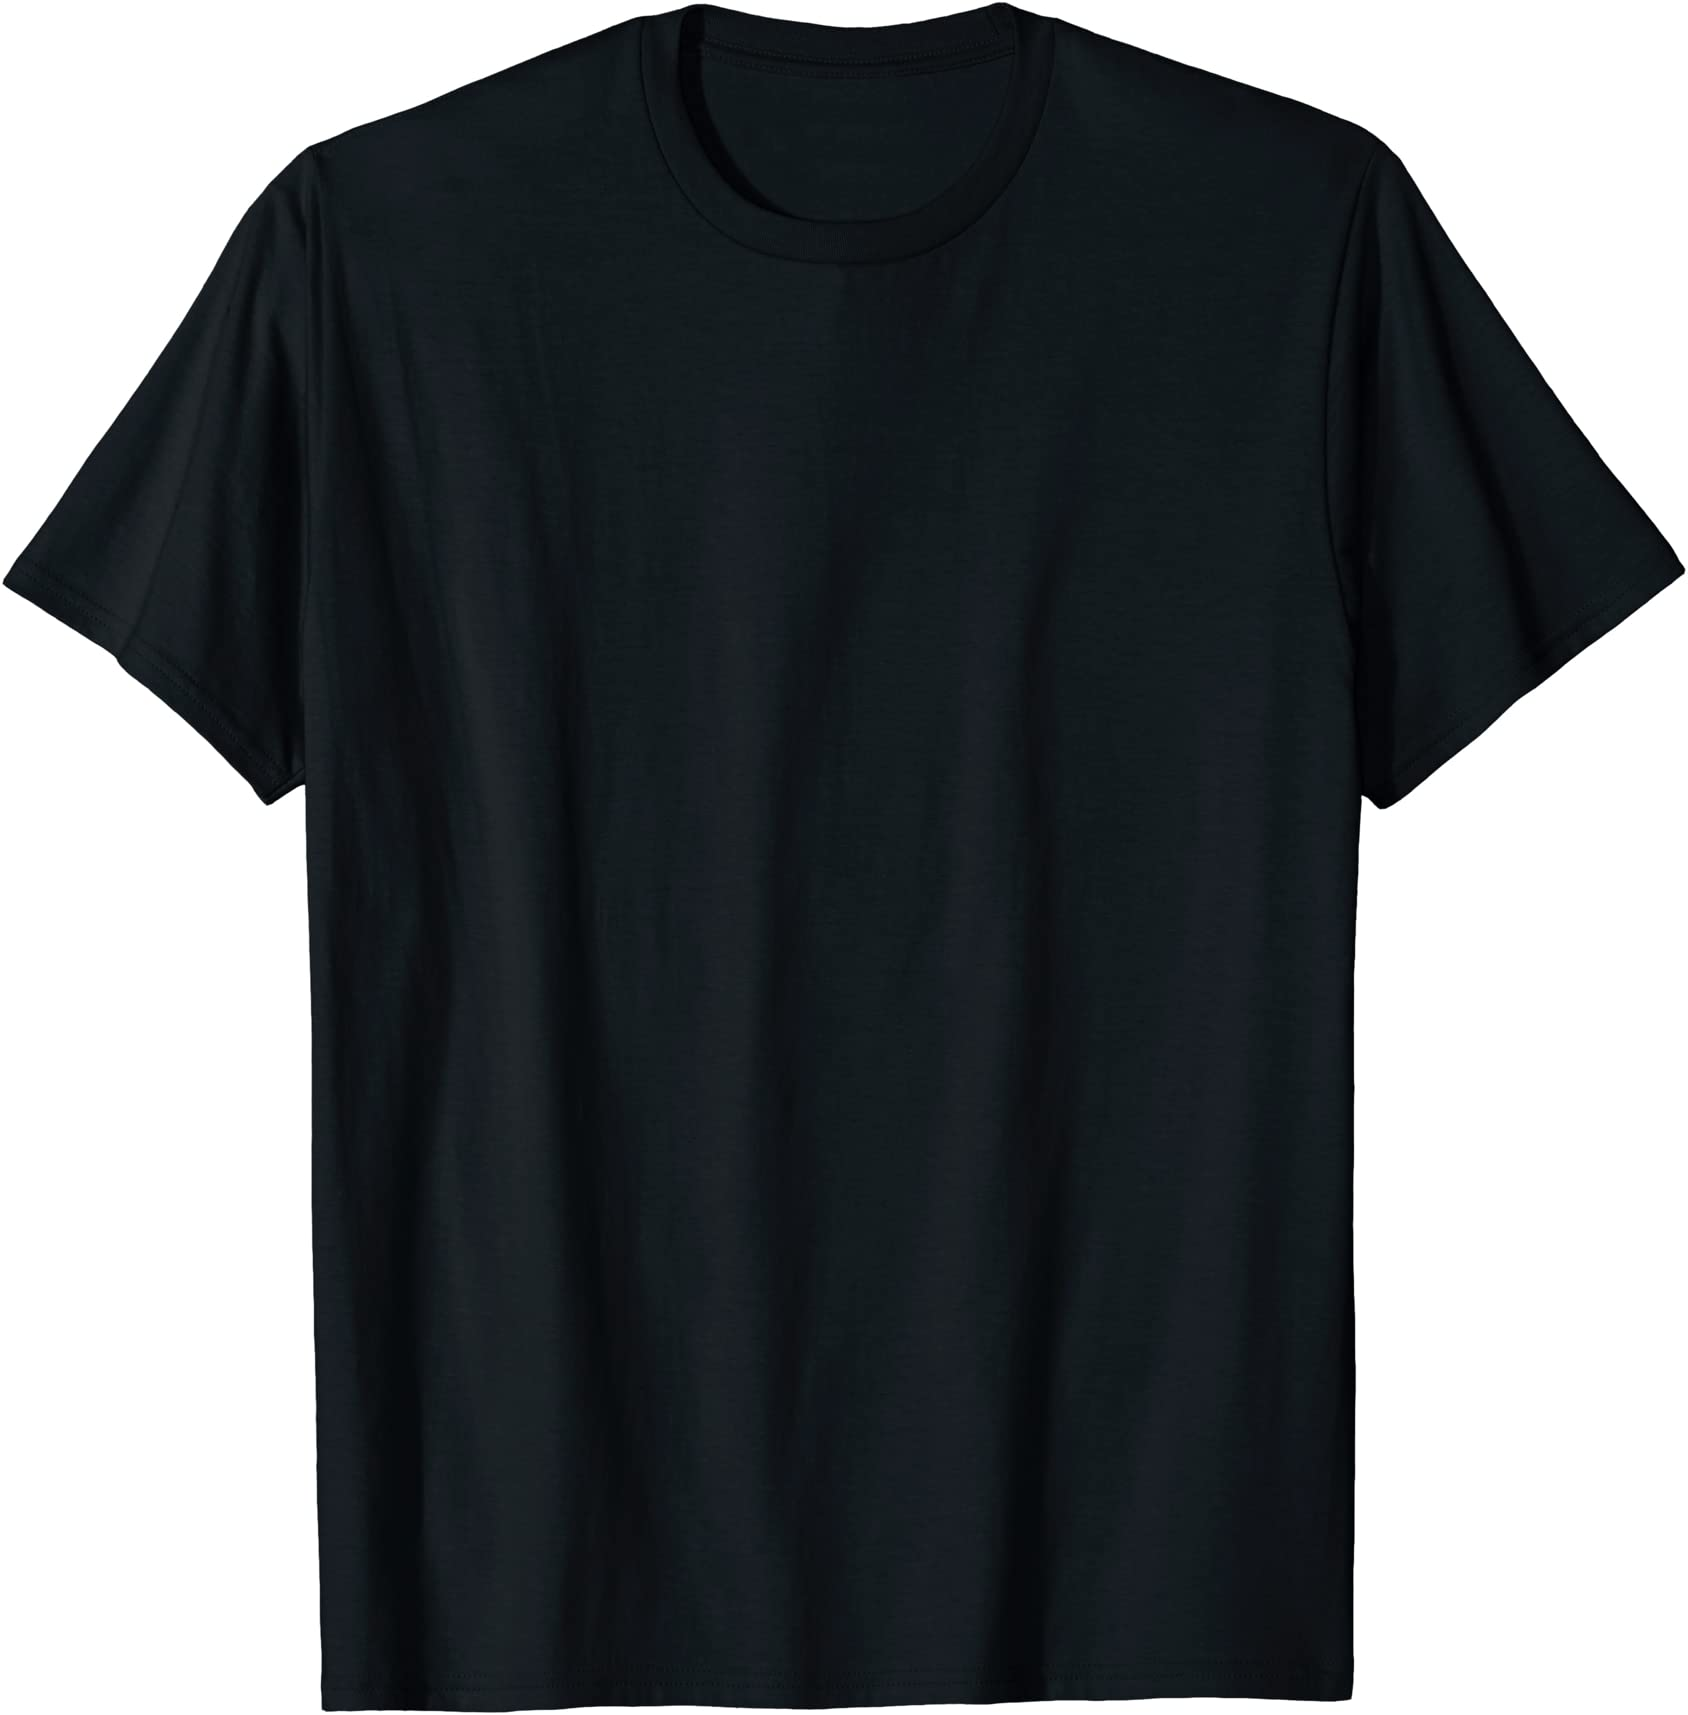 Starfleet Academy ALUMNI Licensed Adult Heather T-Shirt All Sizes